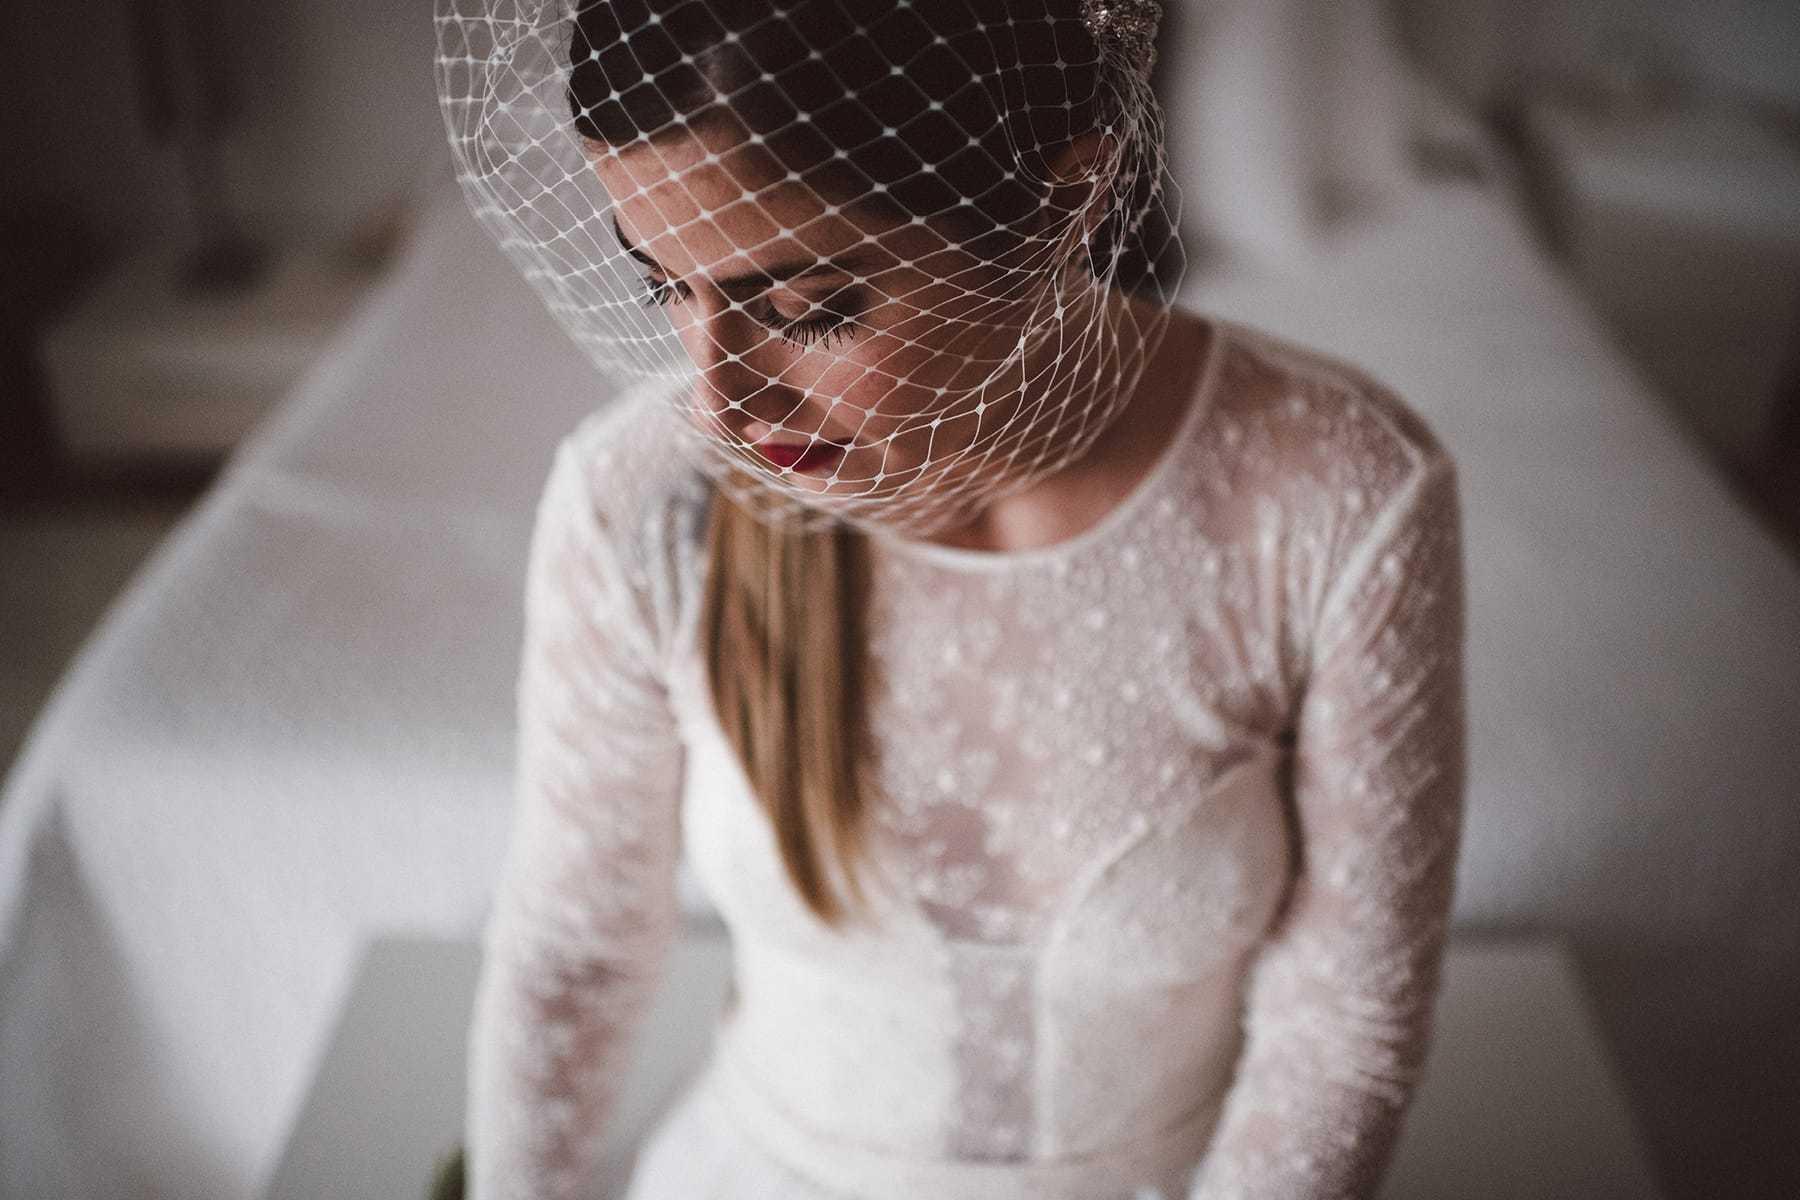 vestido_de_novia_otaduy_hilario_sanchez_fotografo_boda_barcelona_043